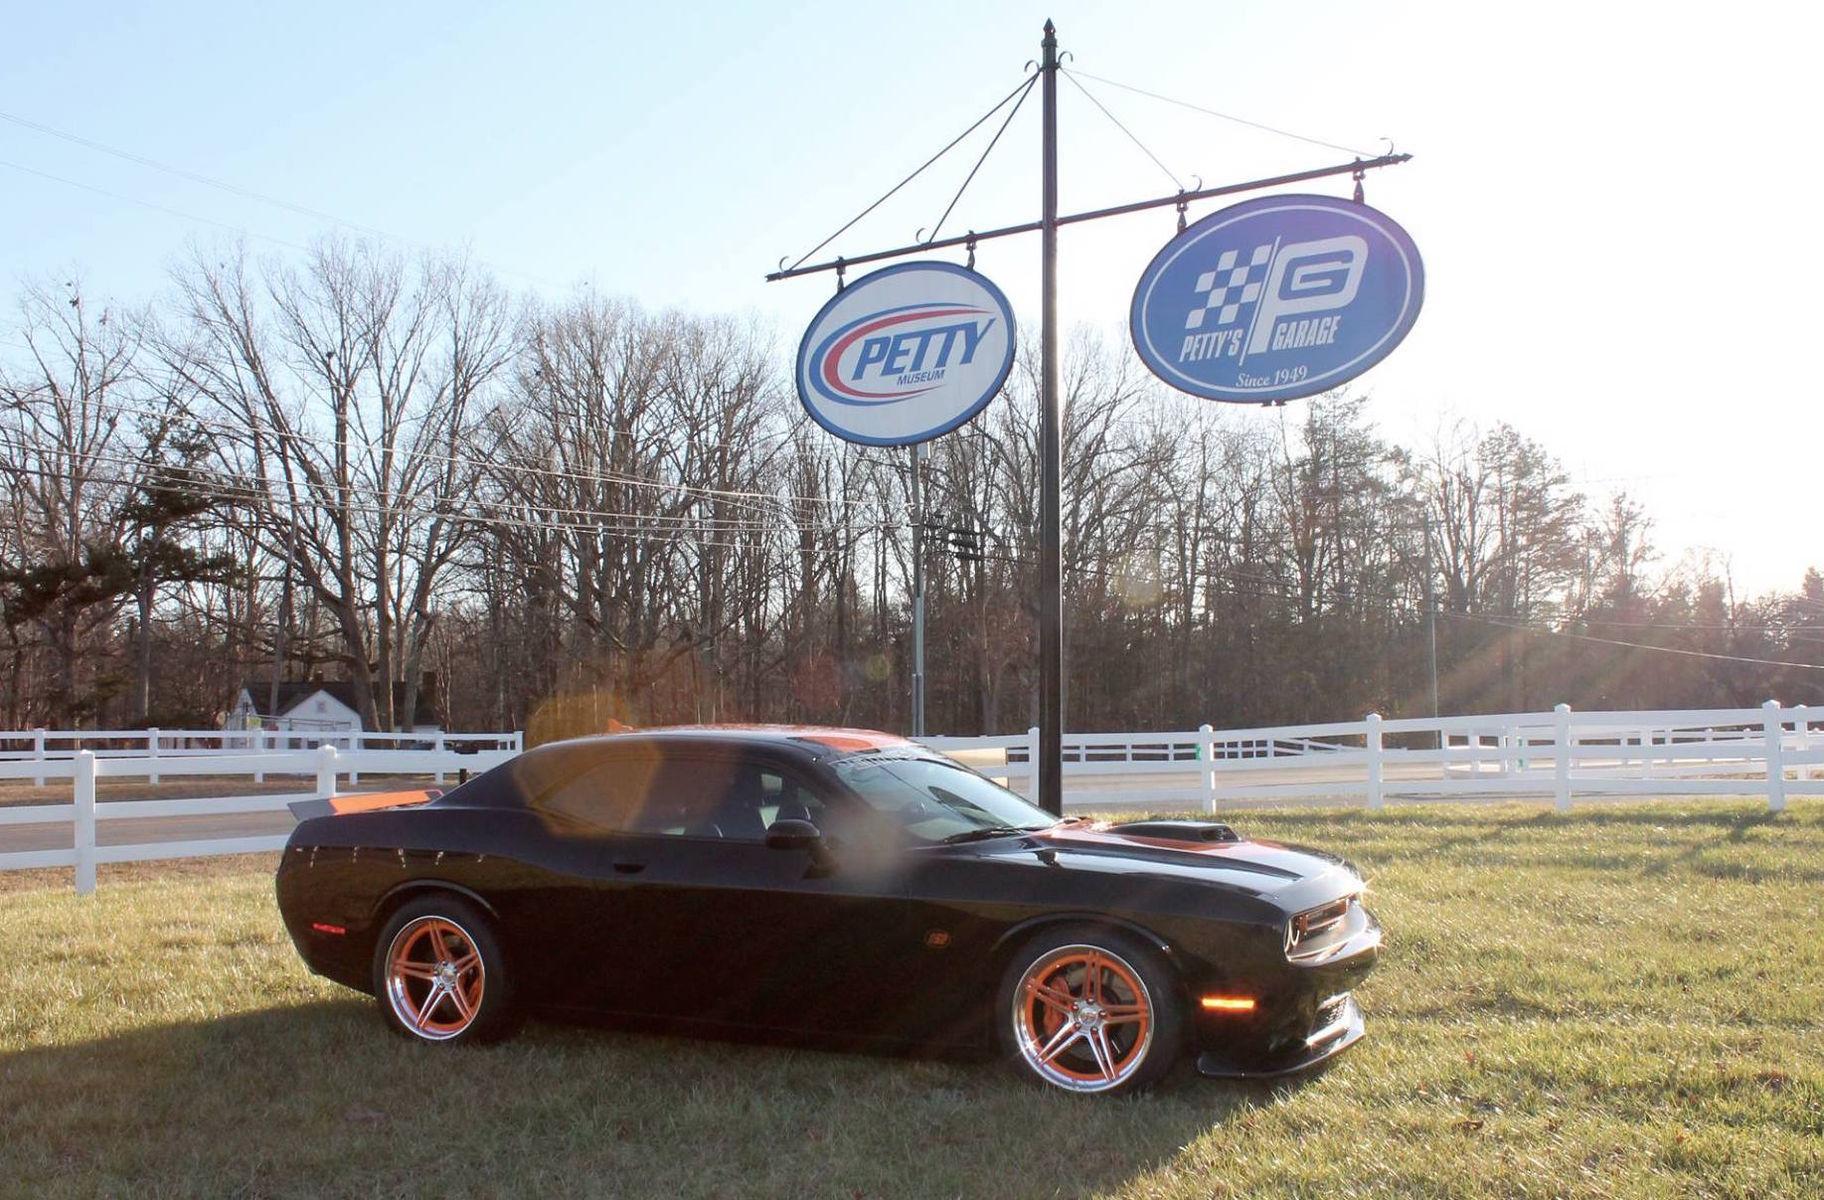 2016 Dodge Challenger | Petty's Garage Supercharged 2016 Dodge Challenger on Forgeline SC3C-SL Concave Wheels